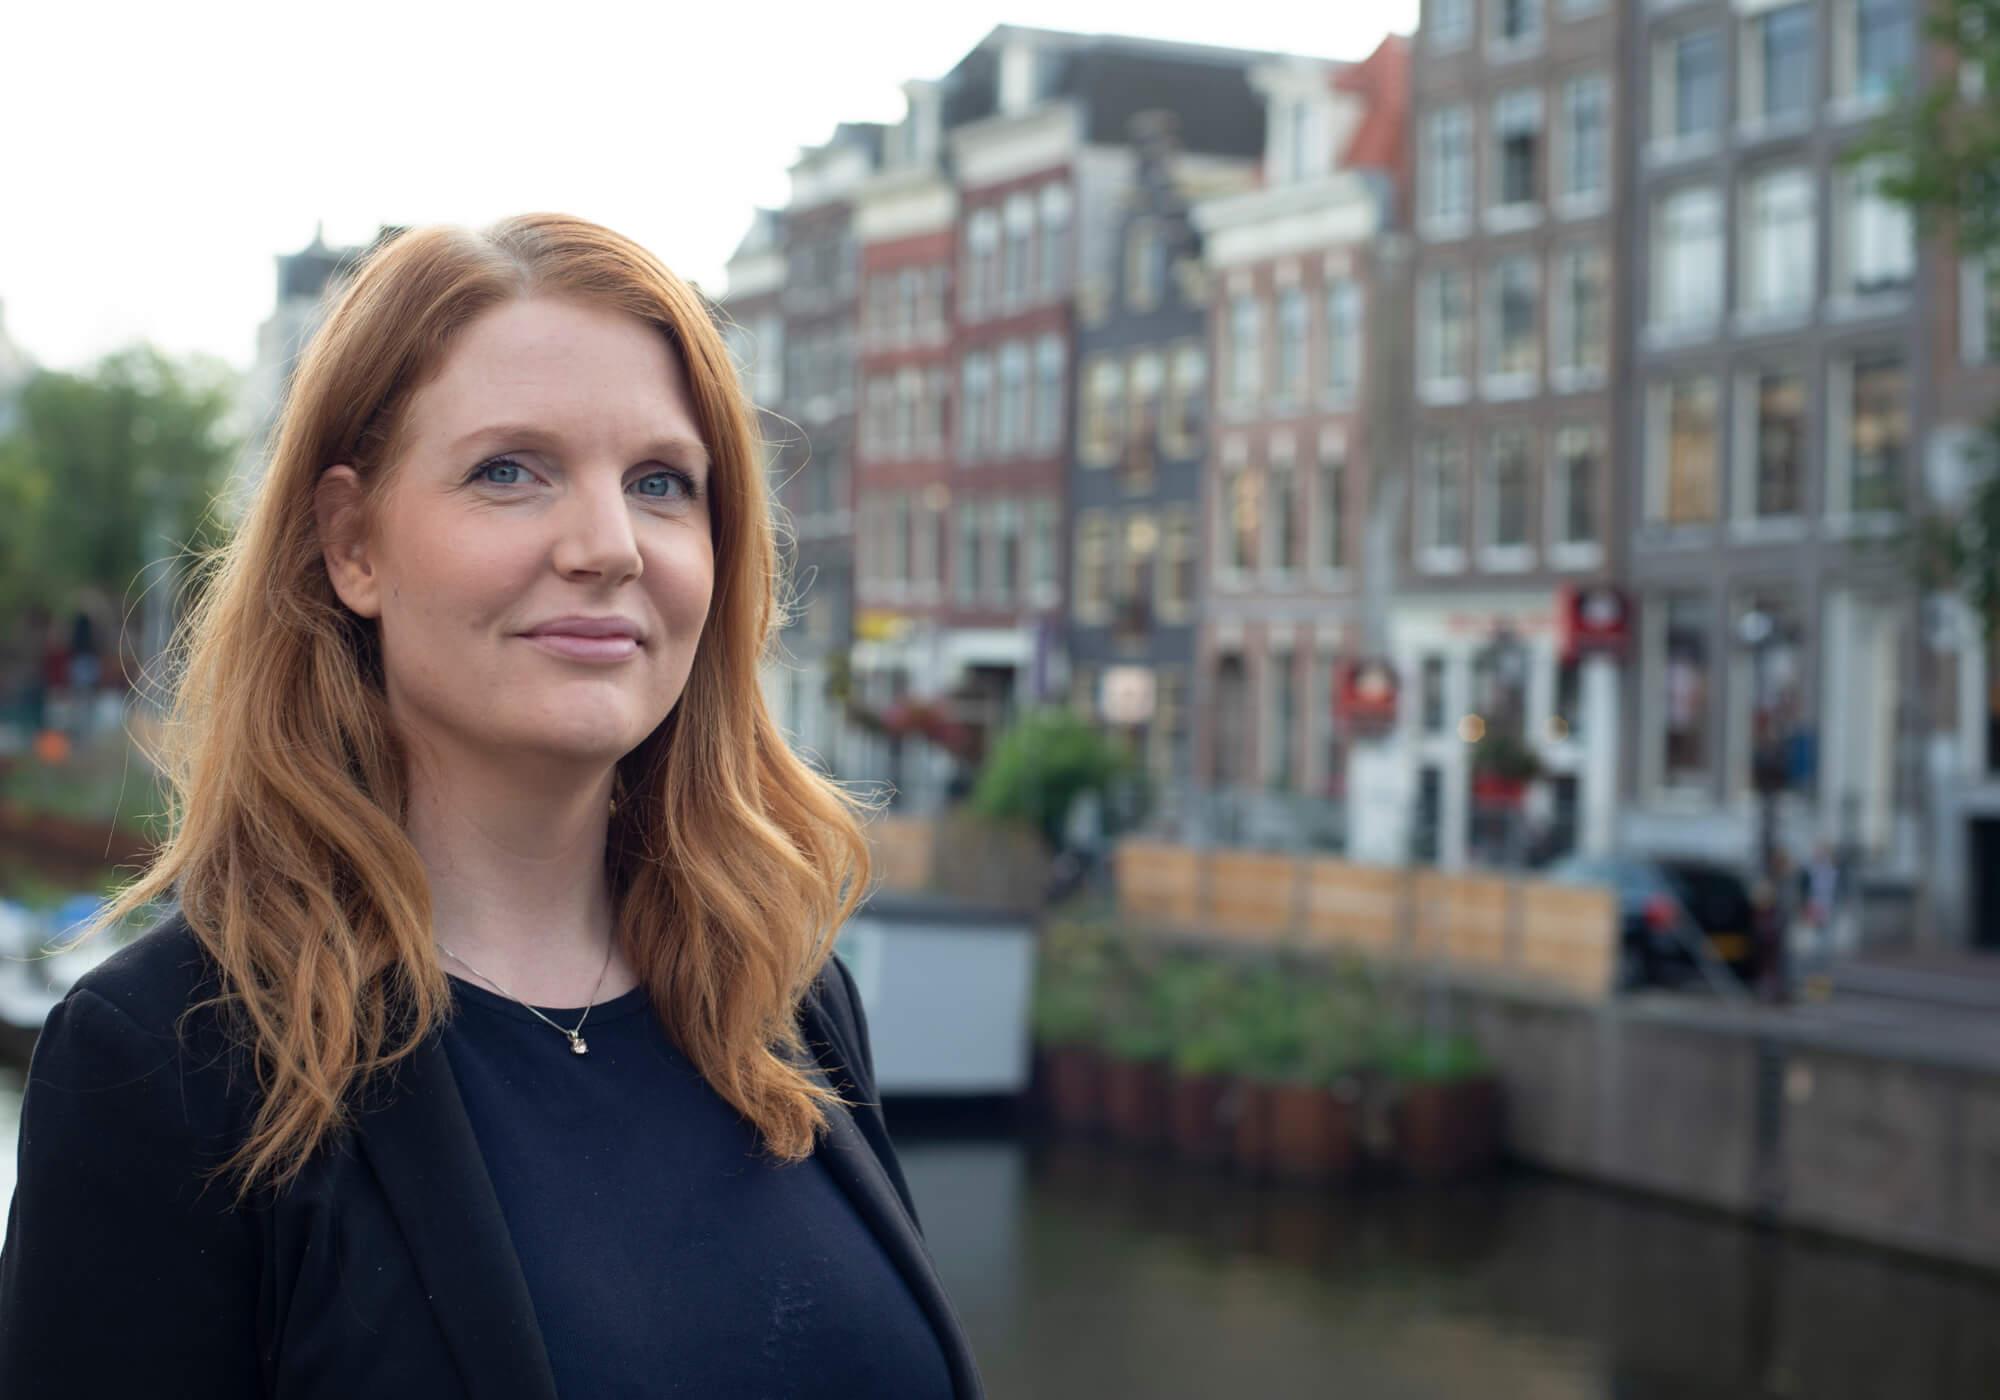 https://www.ecjanvangoyen.nl/wp-content/uploads/2021/04/Barbara-Petri.jpg